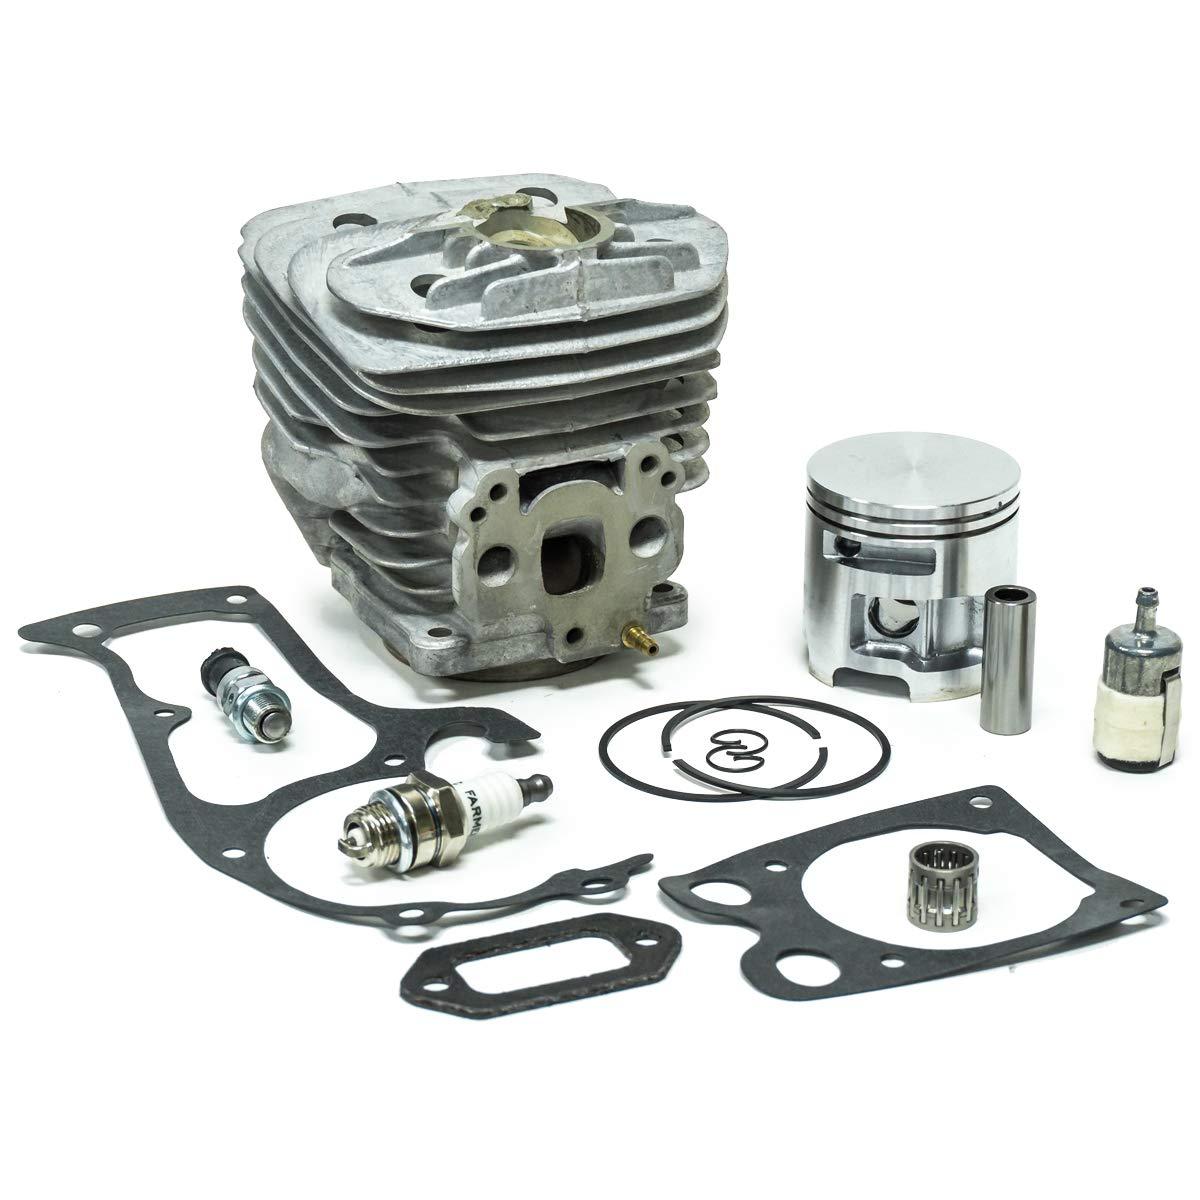 51MM Nikasil Cylinder Piston Gasket Kit for Husqvarna 575 575XP 570 Chainsaws